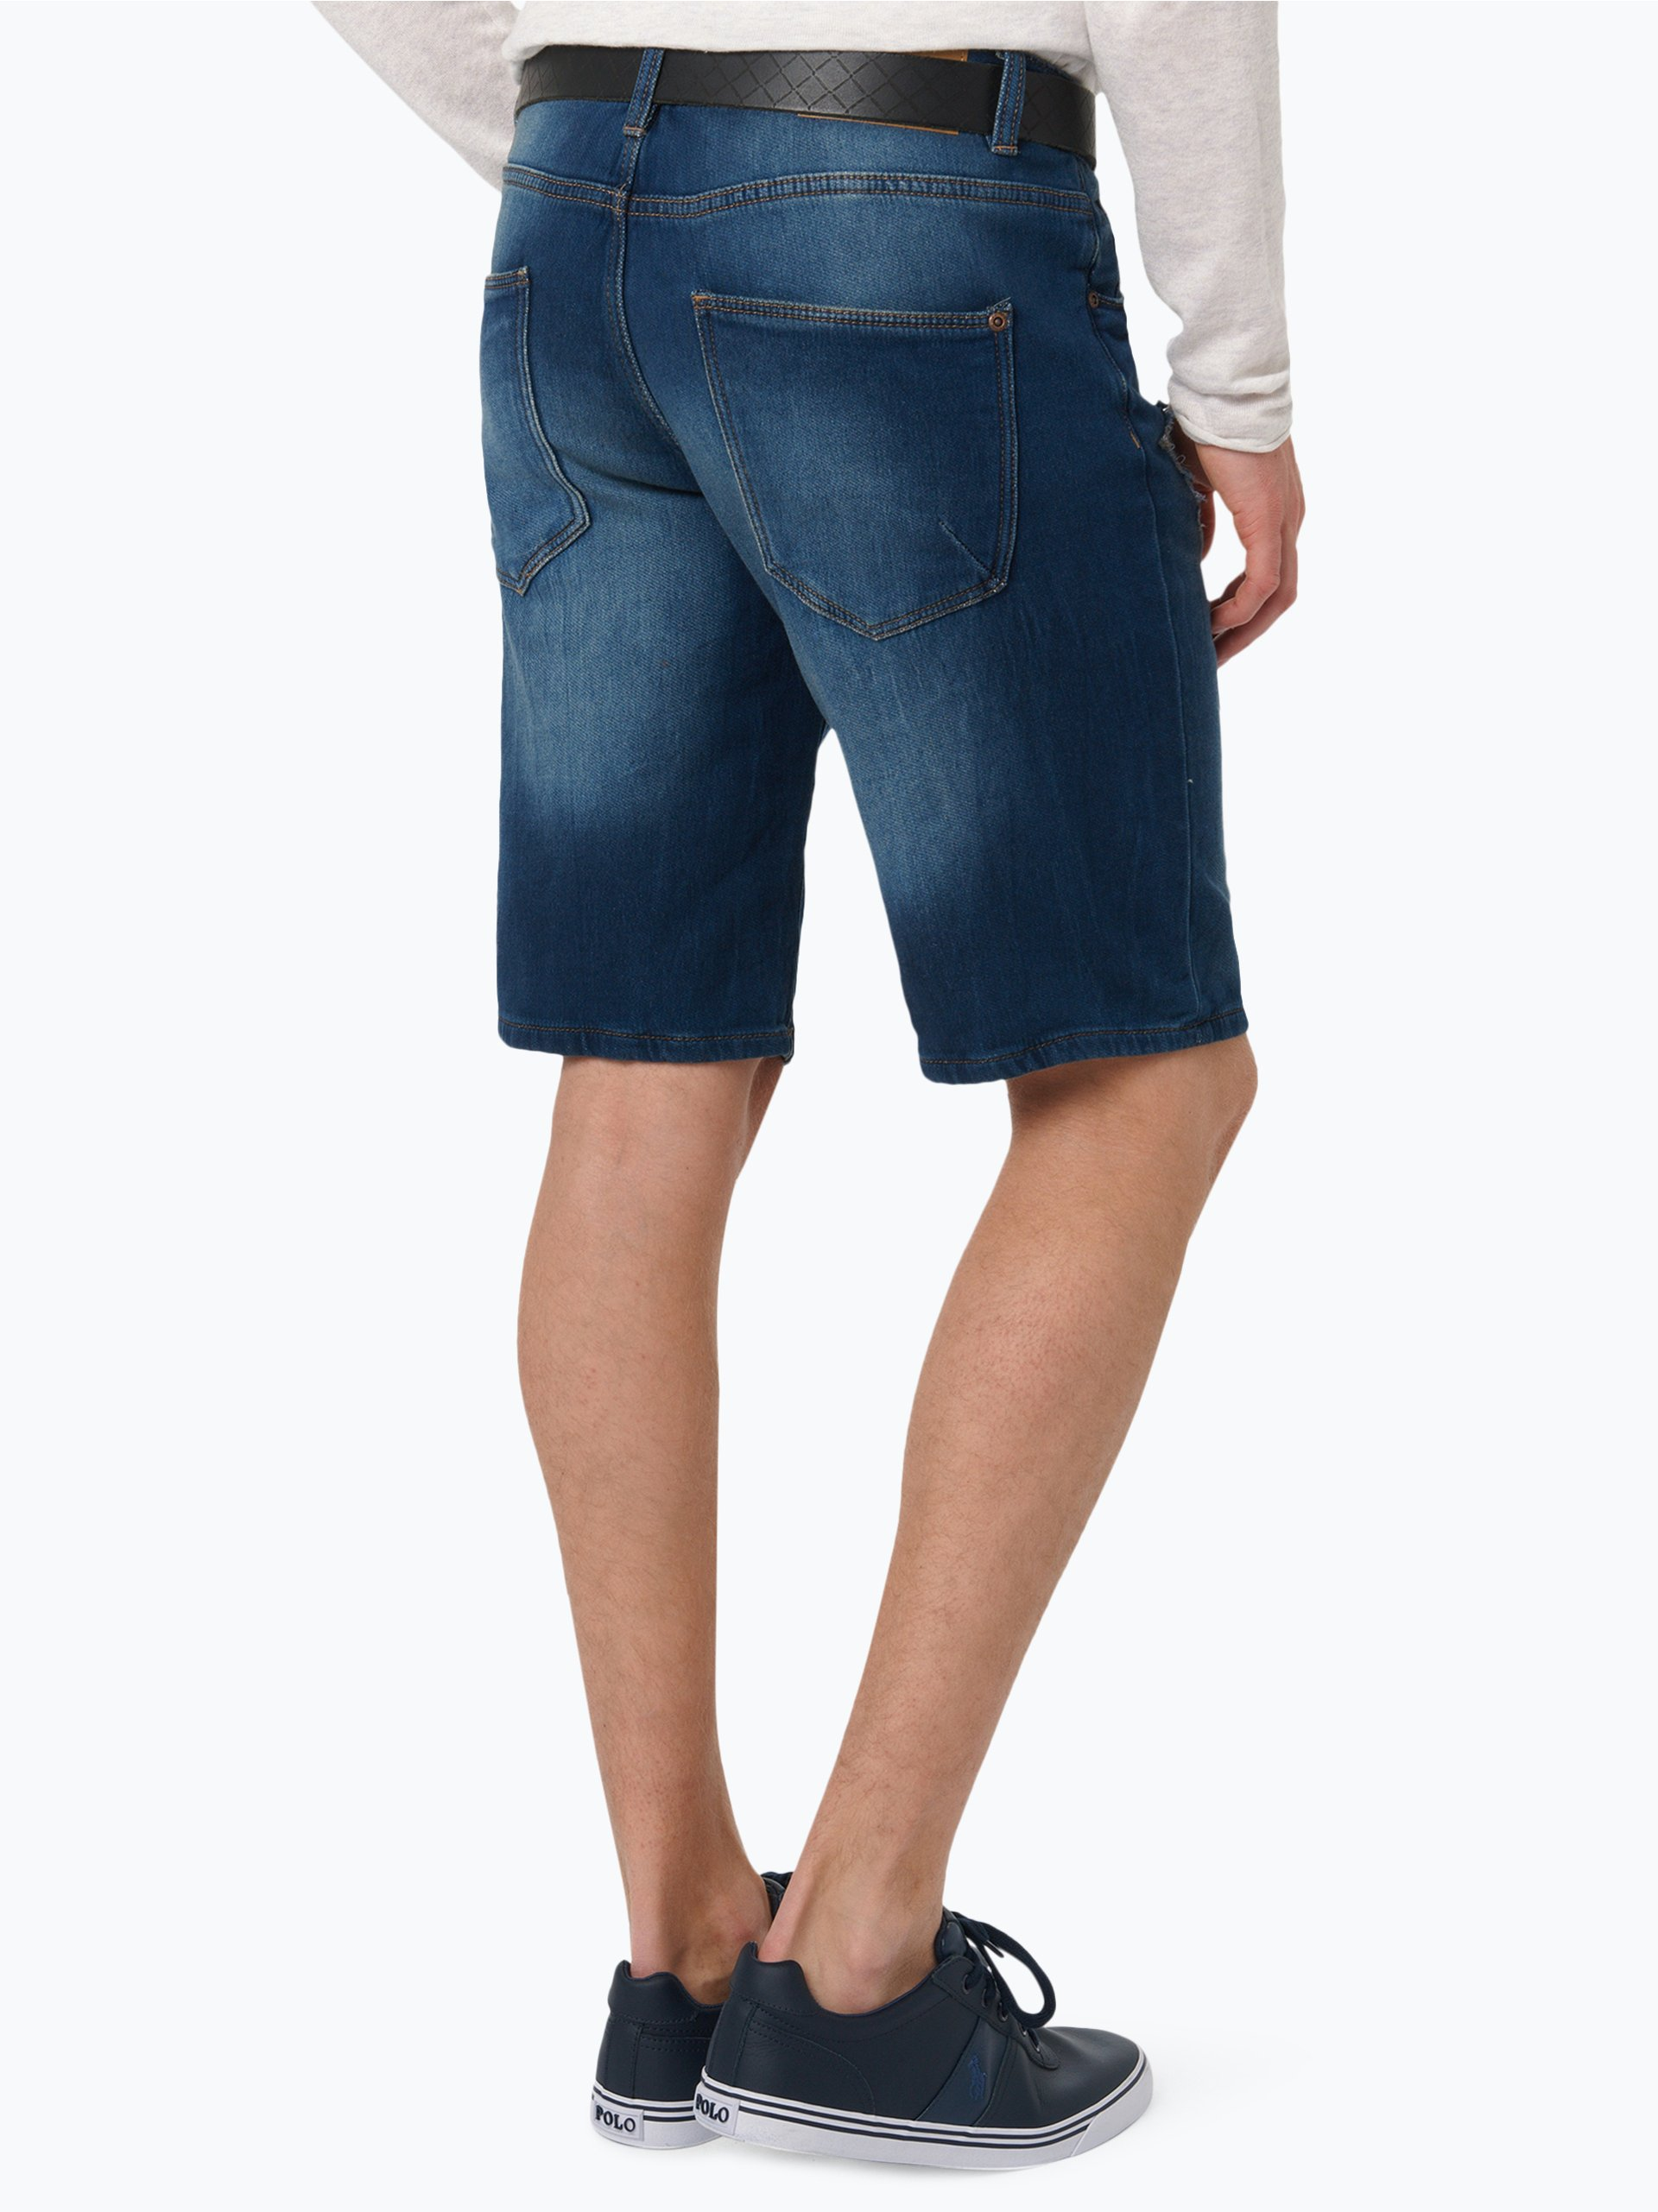 review herren jeans bermuda hellblau blau uni online kaufen peek und cloppenburg de. Black Bedroom Furniture Sets. Home Design Ideas